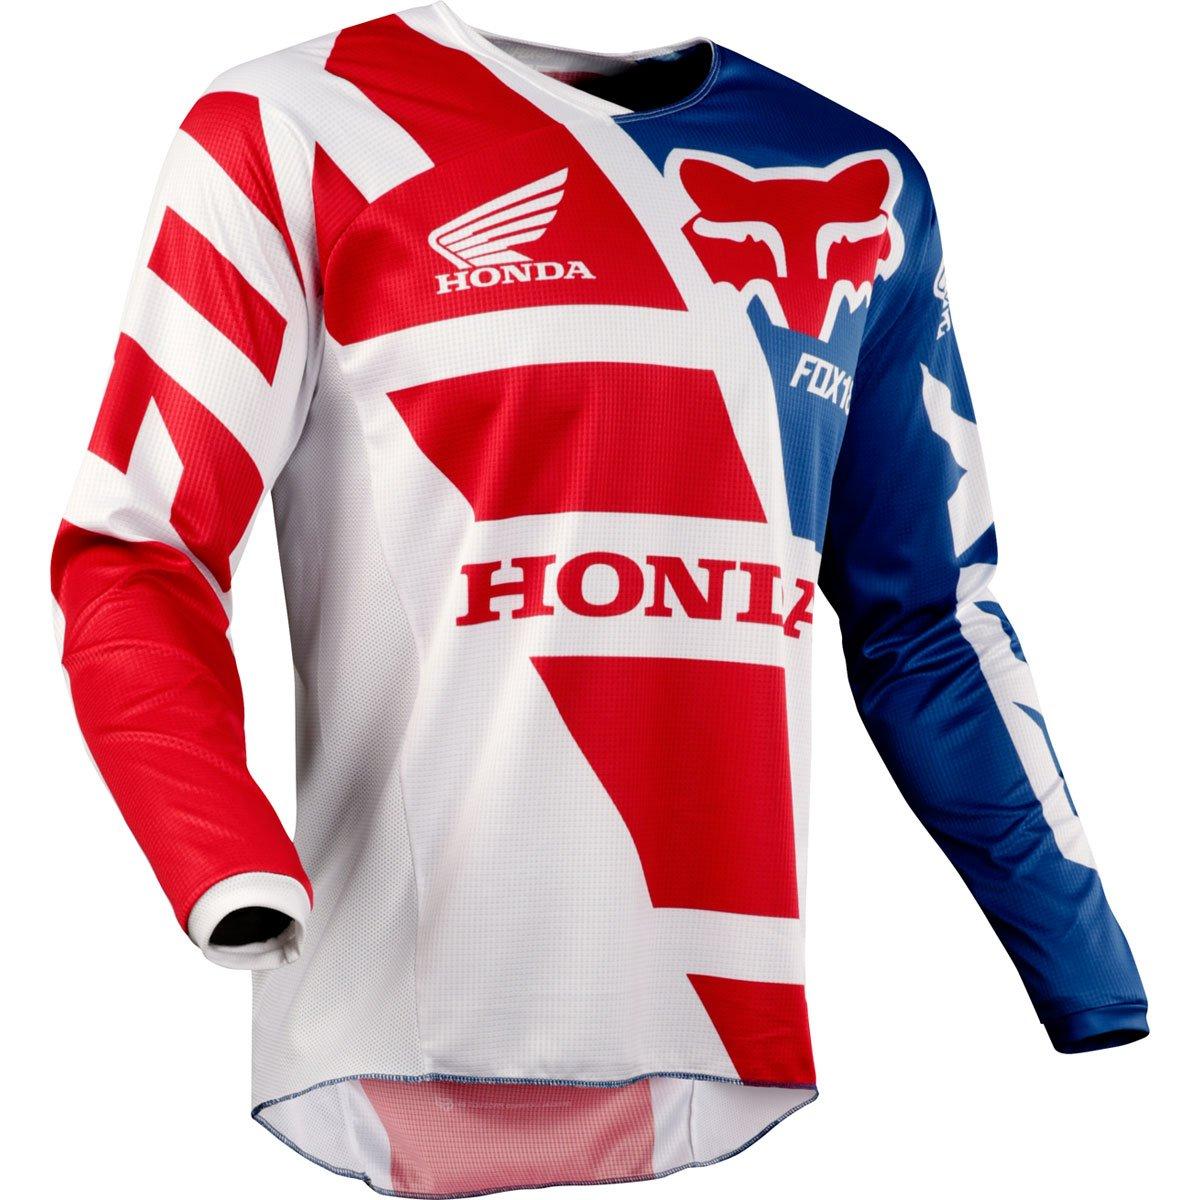 Fox Racing 2018 180 Honda Jersey-XL